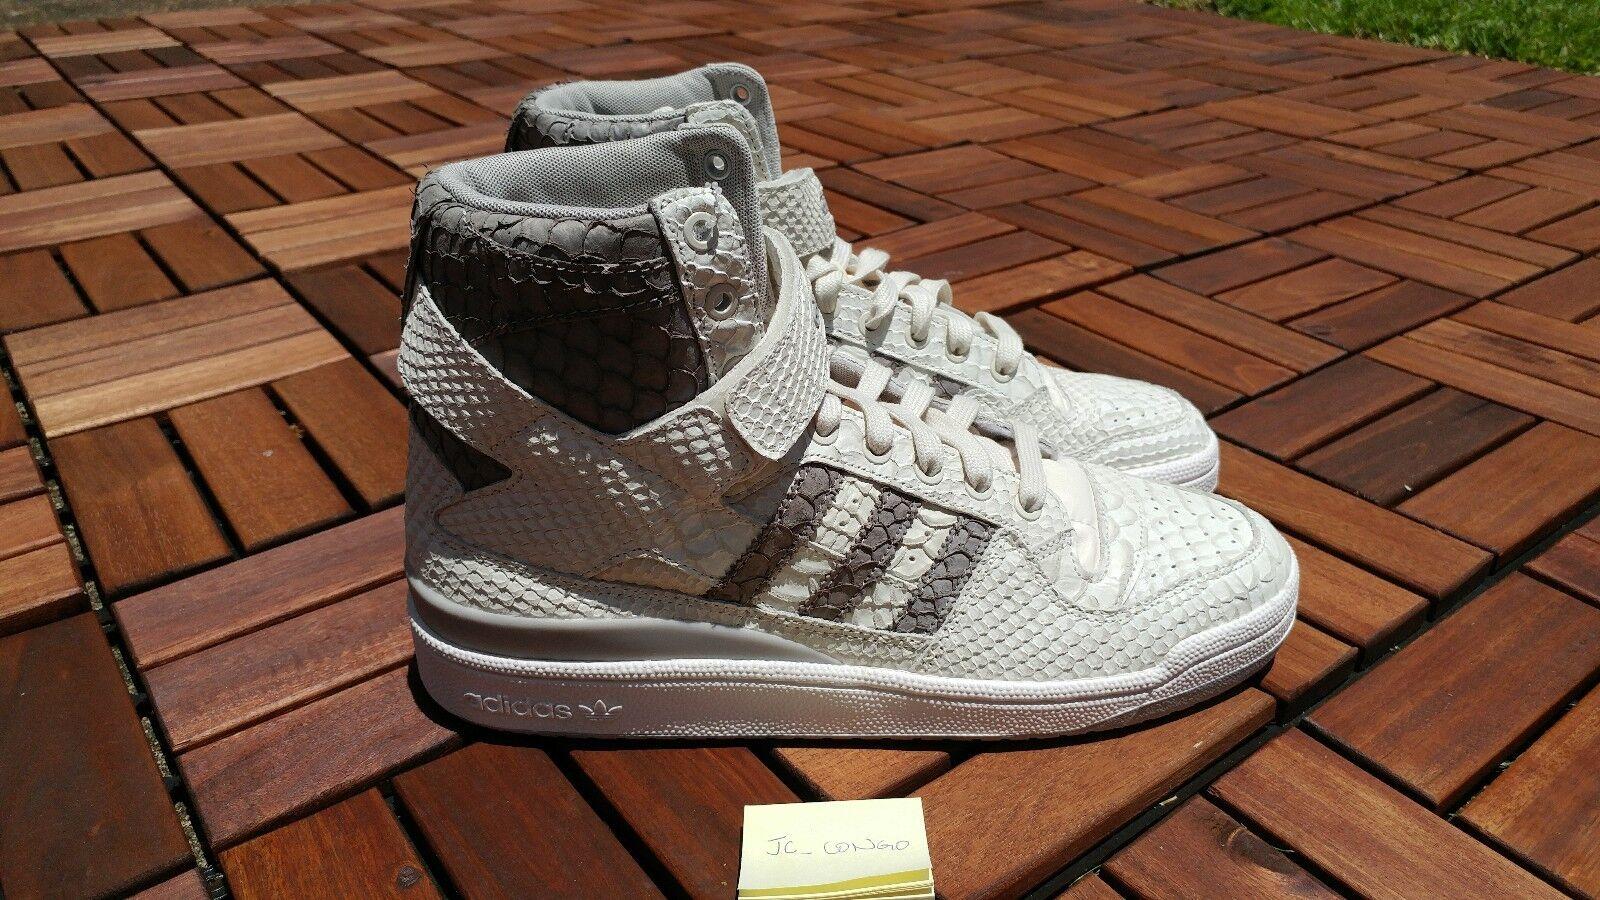 Adidas originals forum hi python og kreidebleich / granit python hi schlangenhaut b27671 ds preissenkung 2151e4